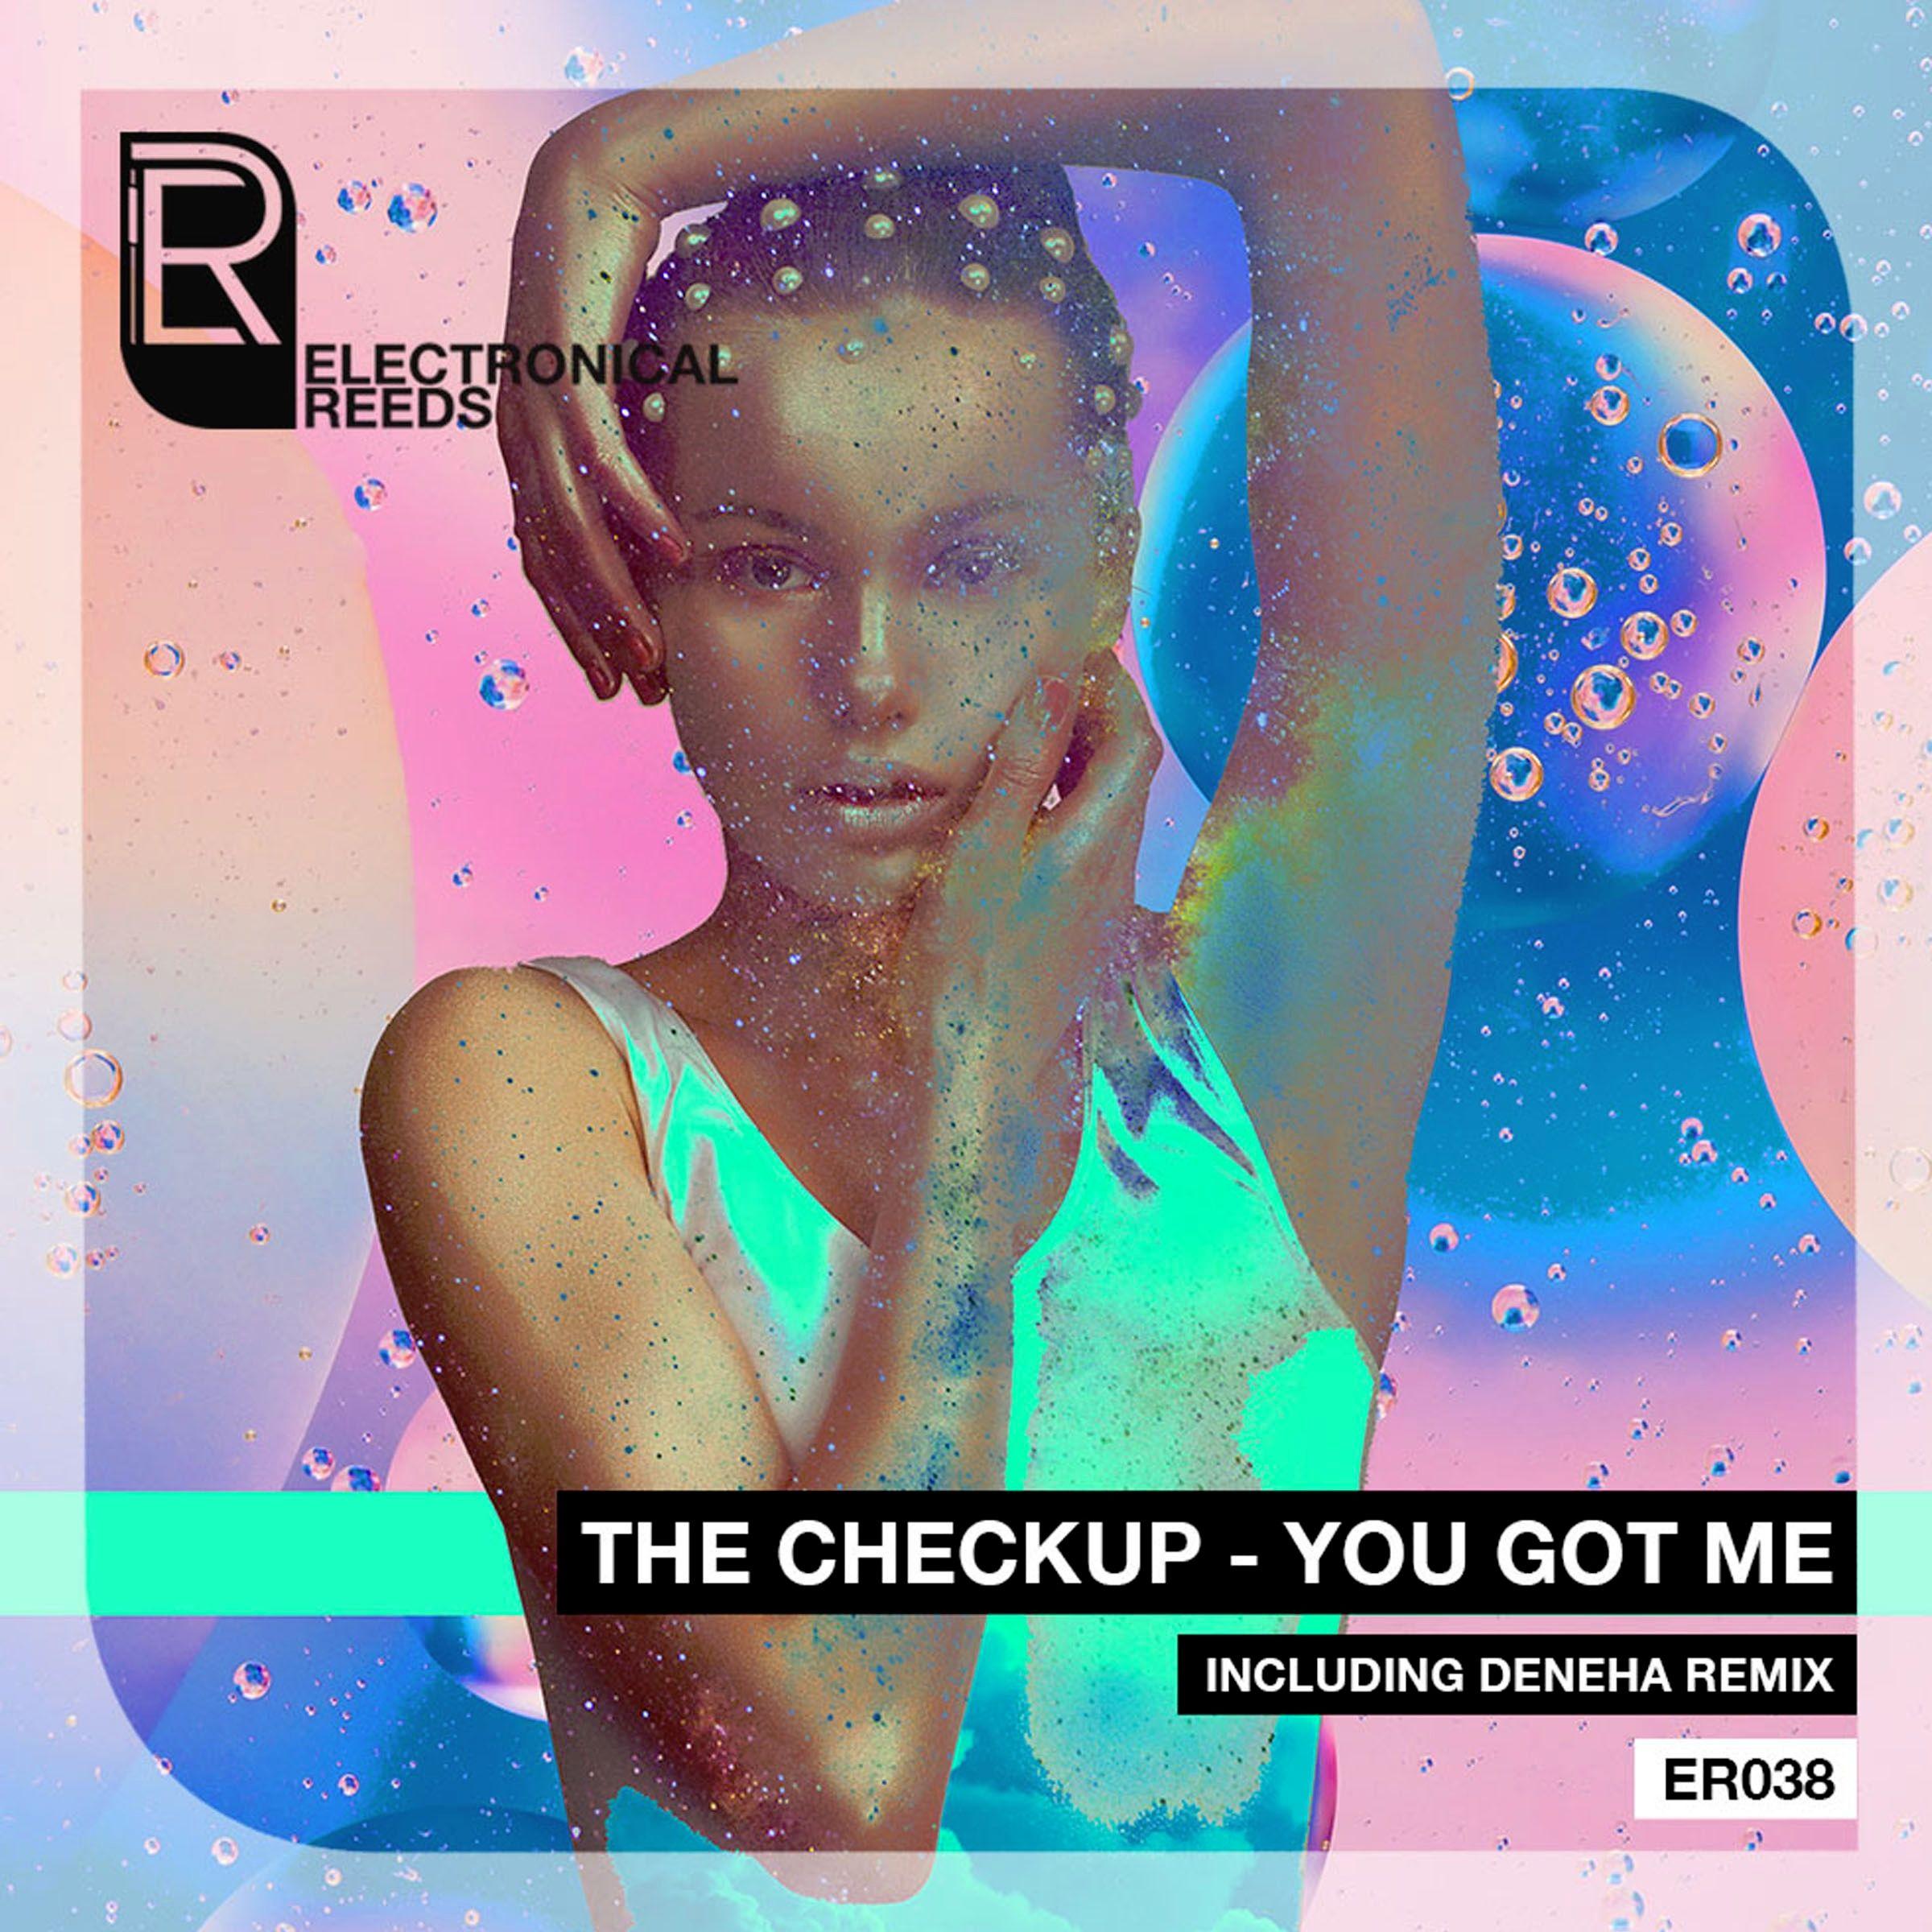 packshot_the_checkup_-_you_got_me_-_electronical_reeds.jpg